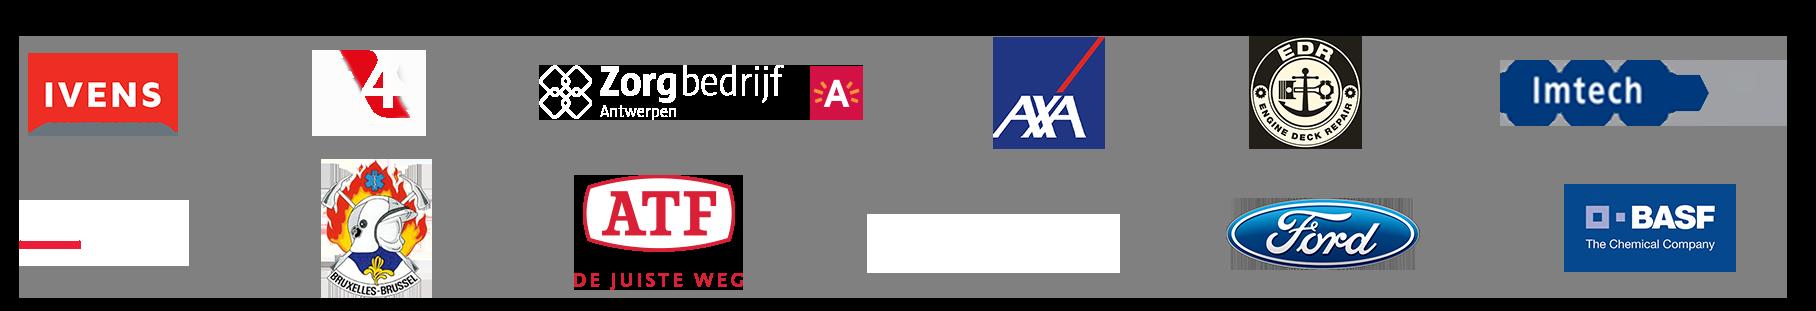 klanten logo samen reclam4.png